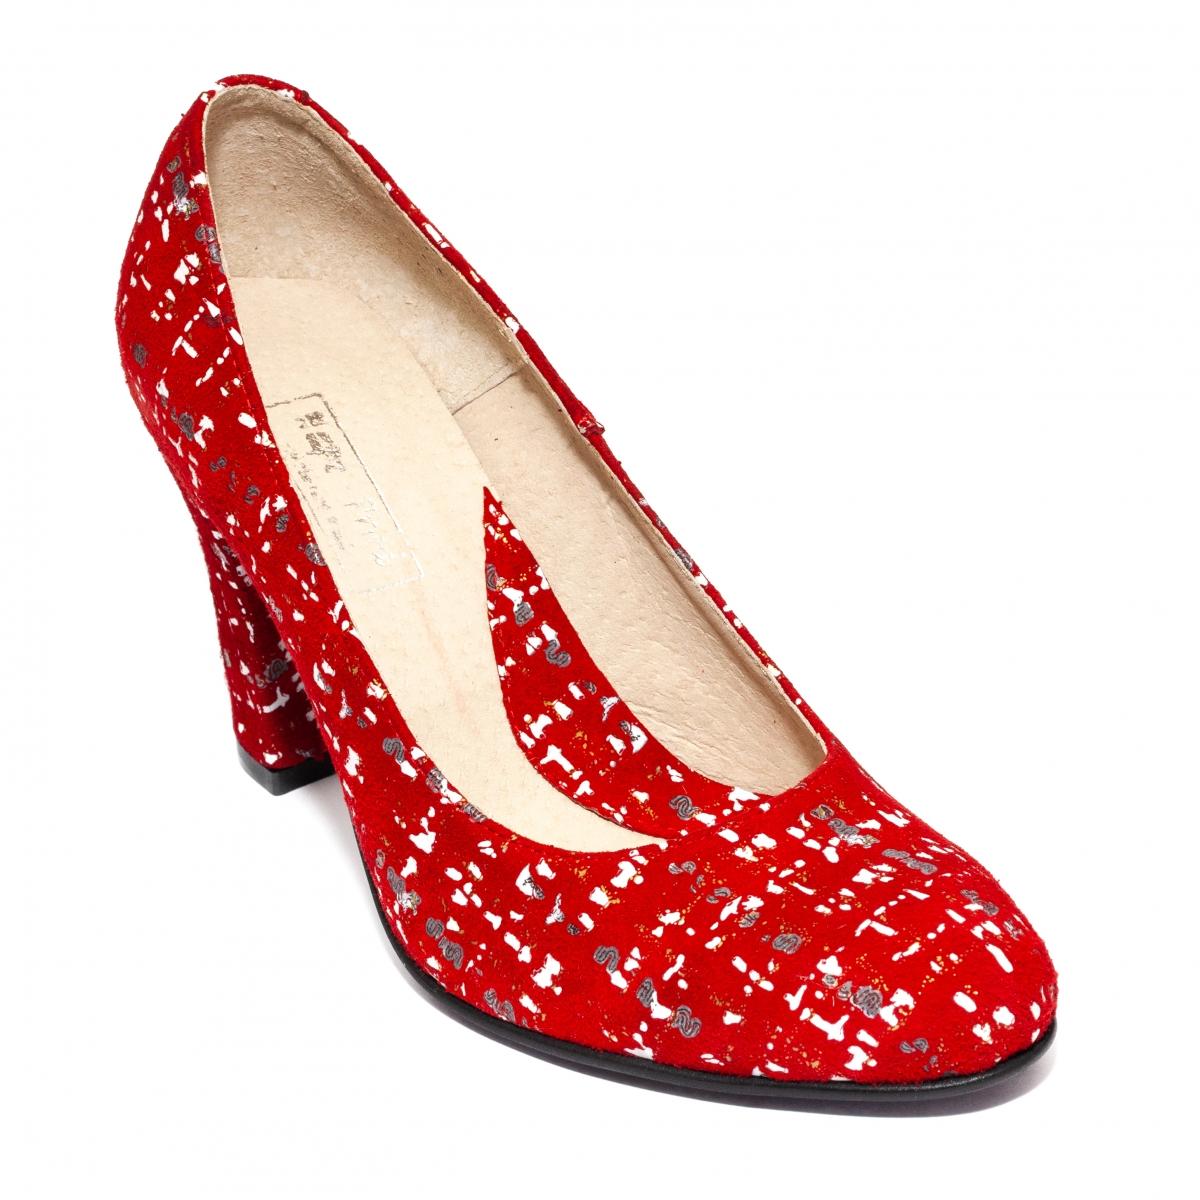 Pantofi dama cu toc 952 negru lux 34-40